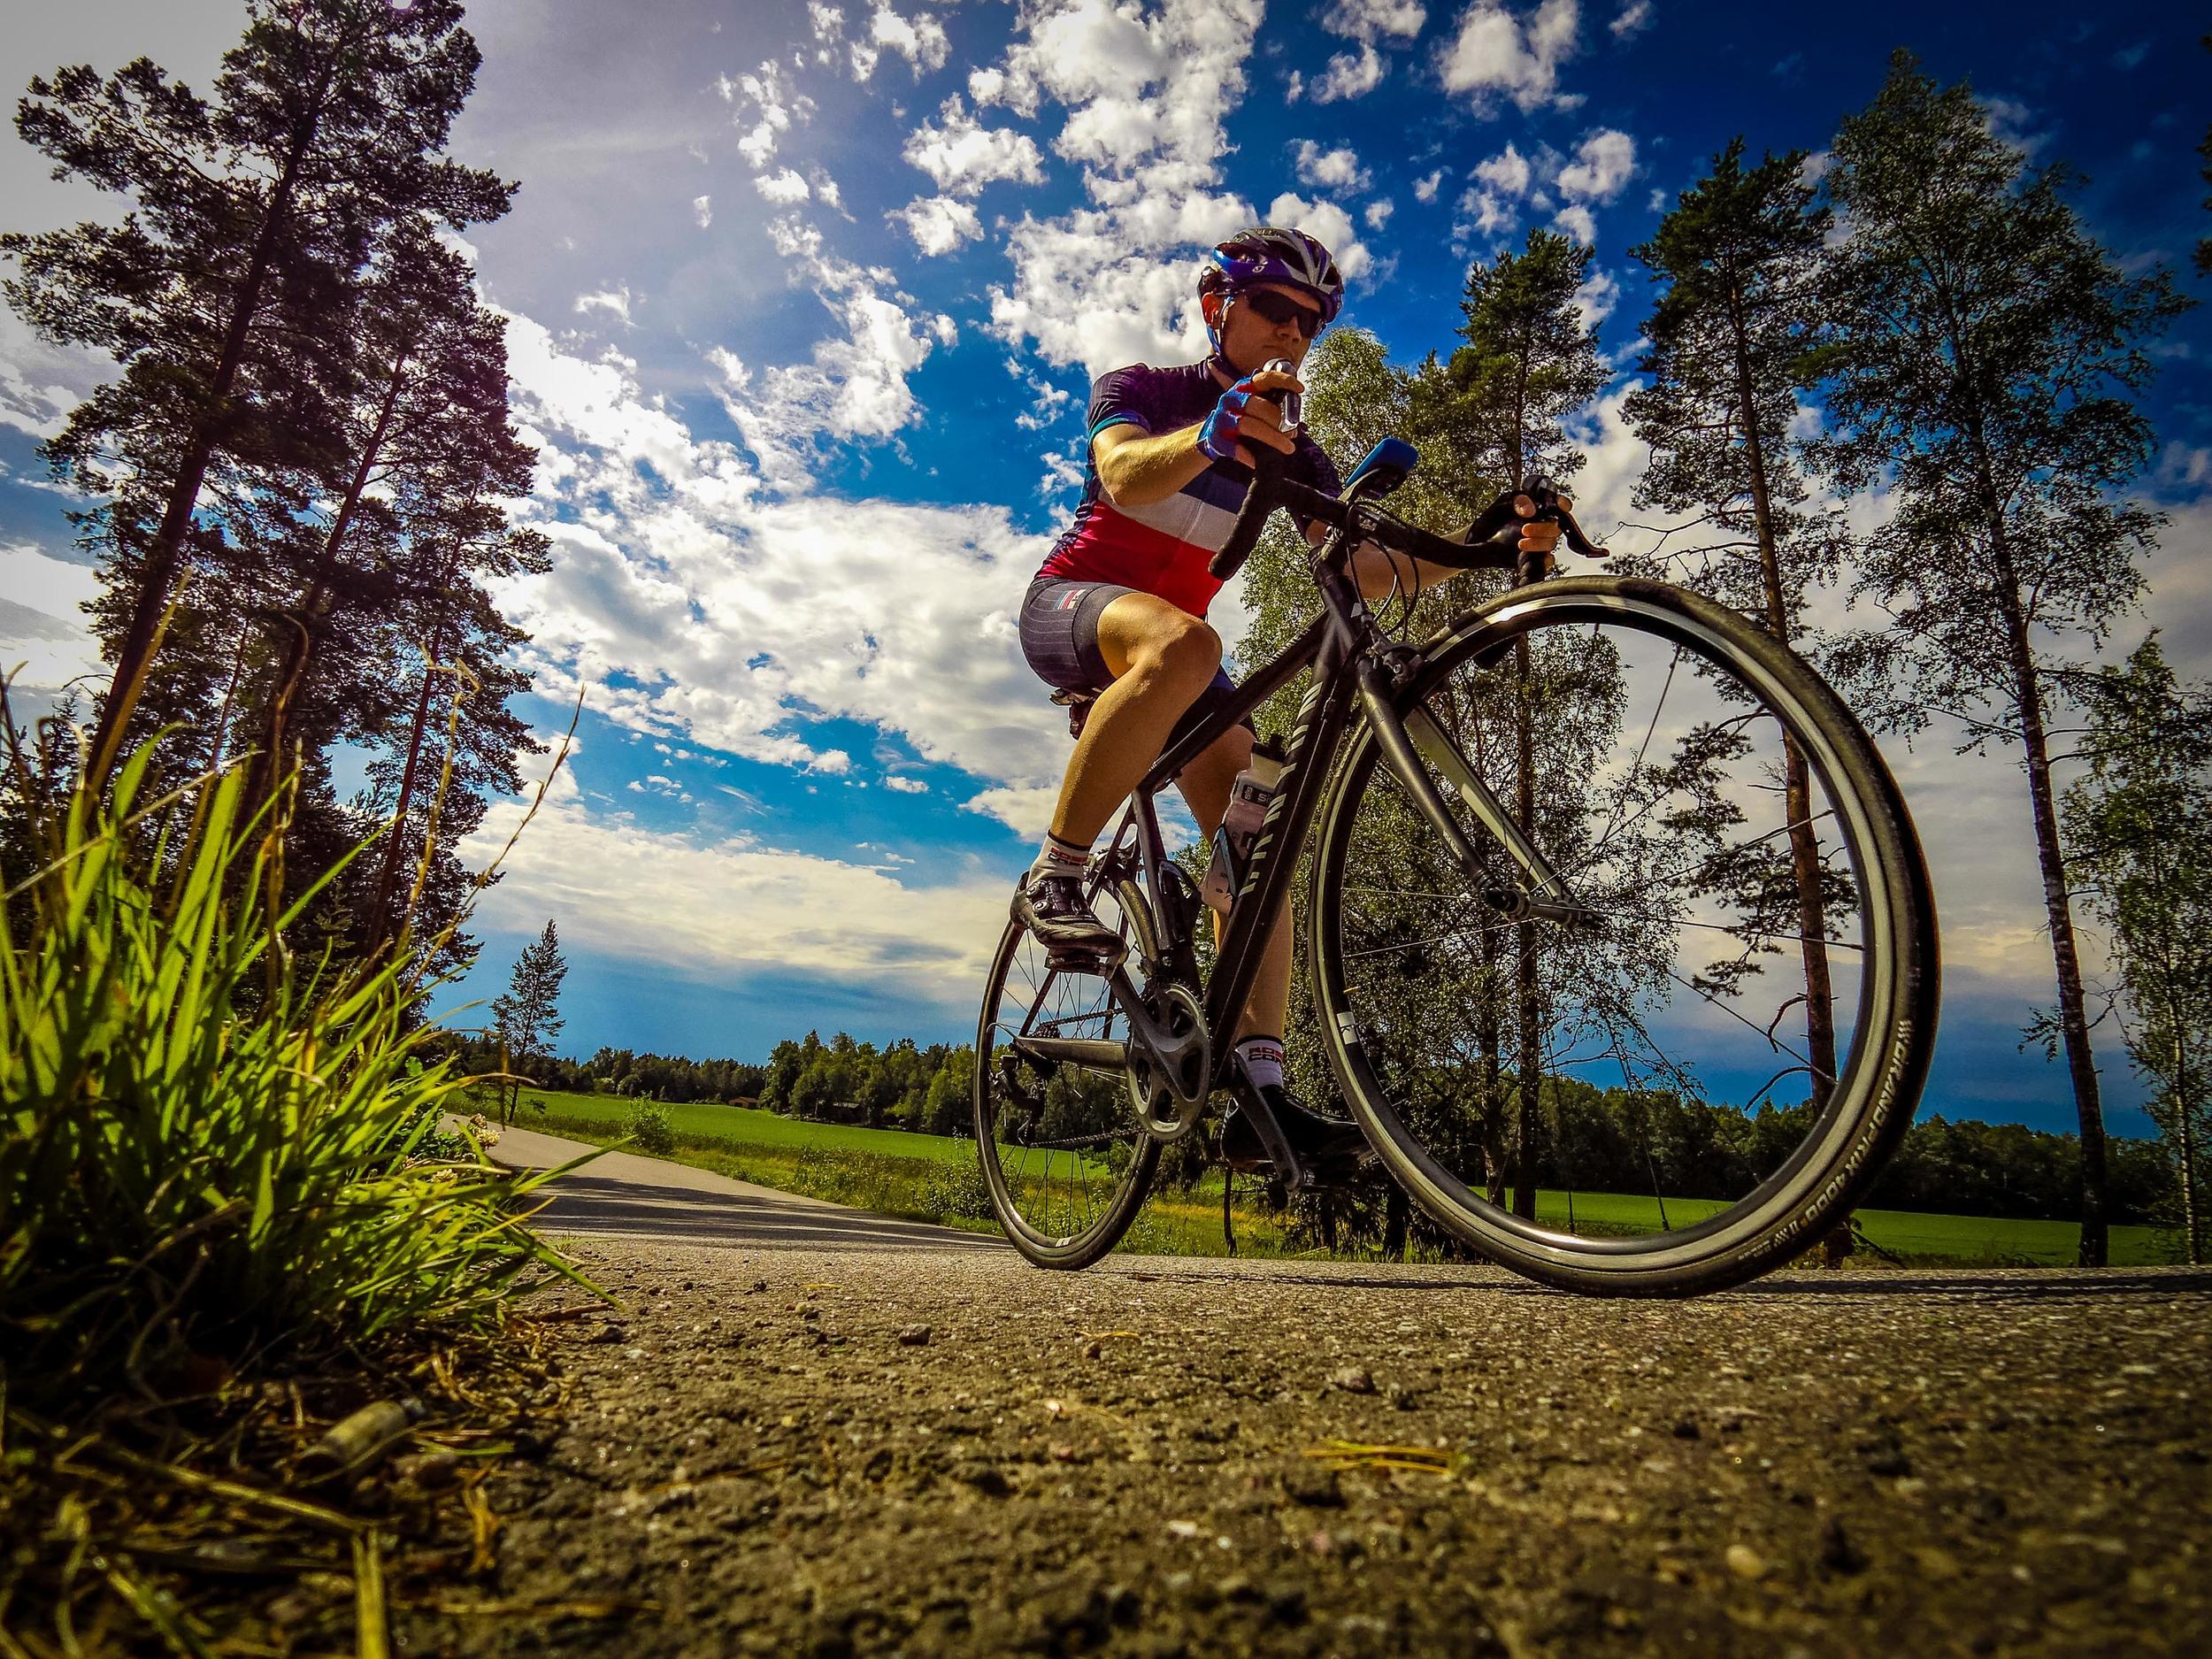 Cycling in ohensaari